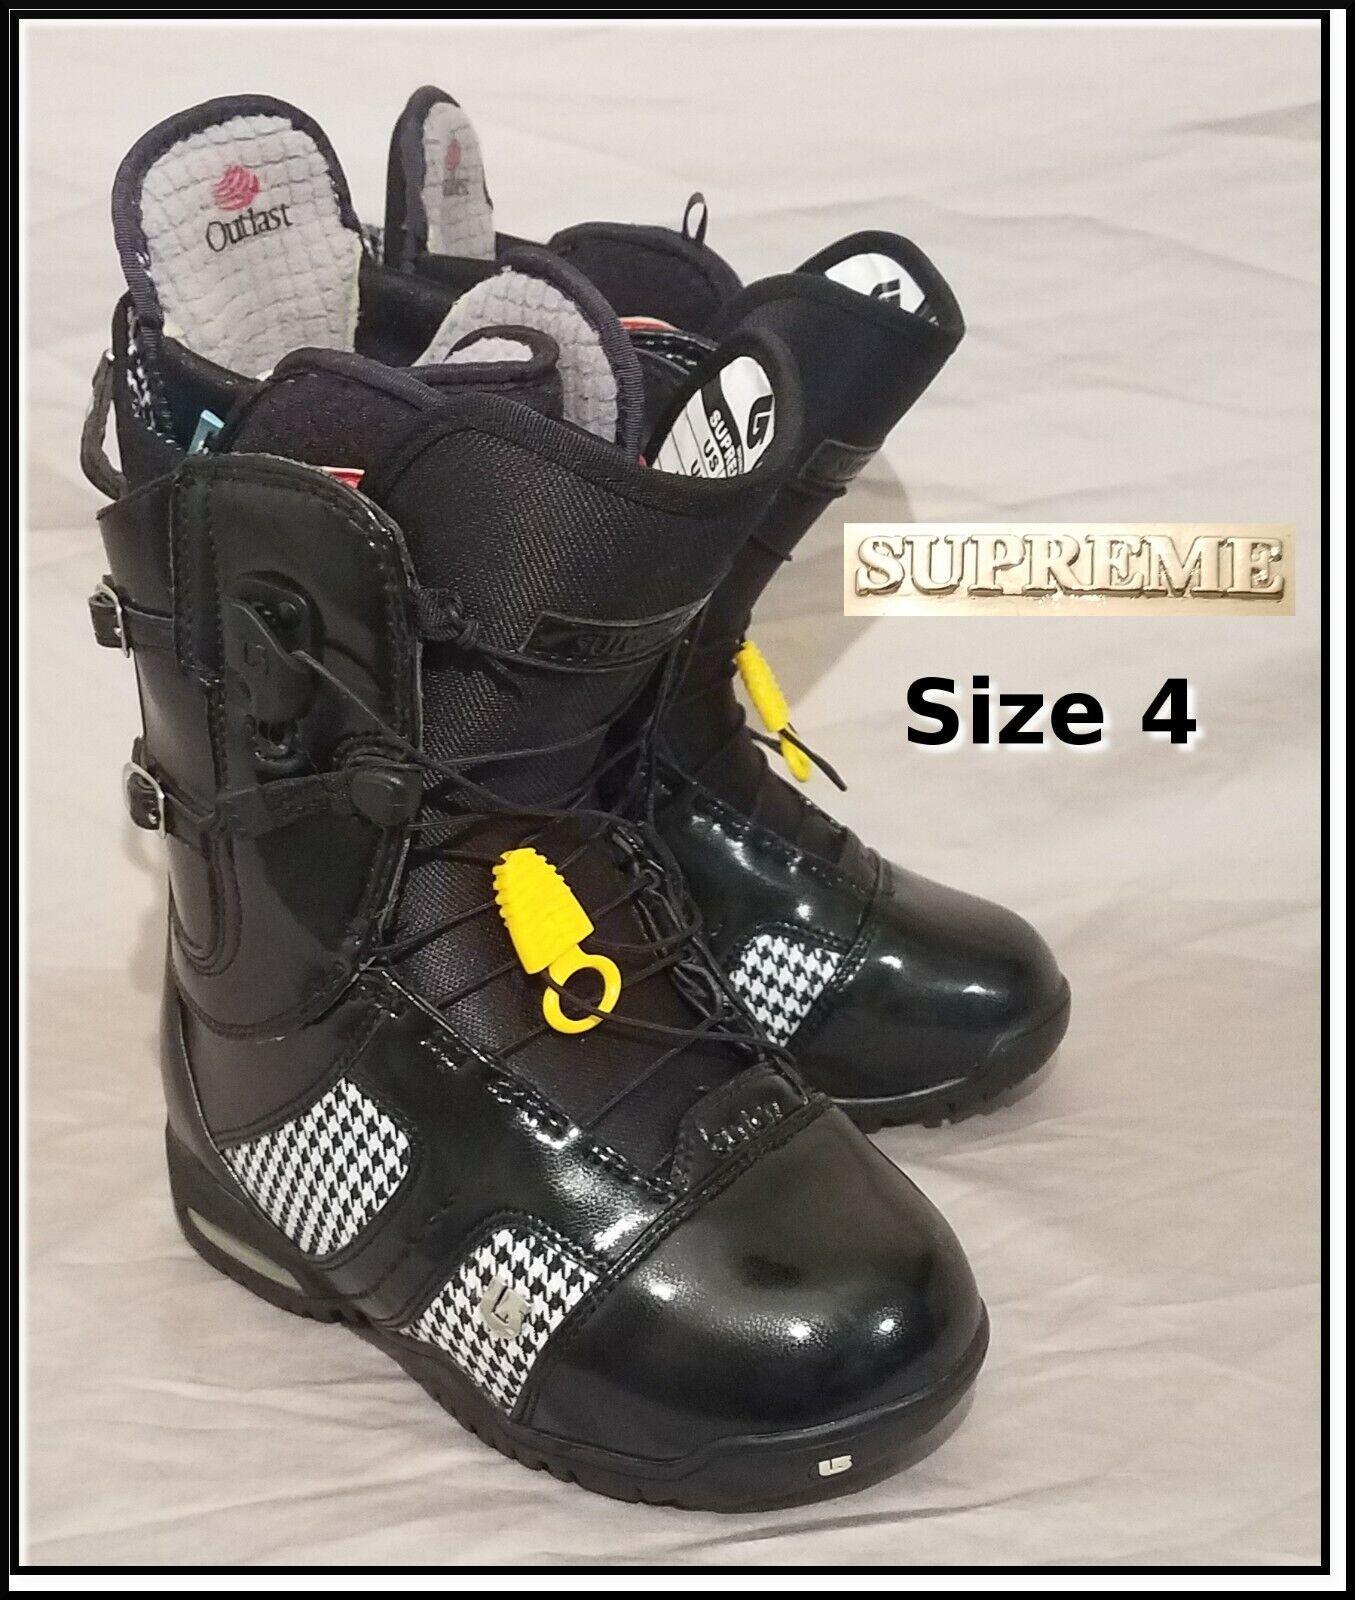 Burton Supreme Size 4 Snowboard Boots Women's Girl's Girls Womens Snowboarding 2